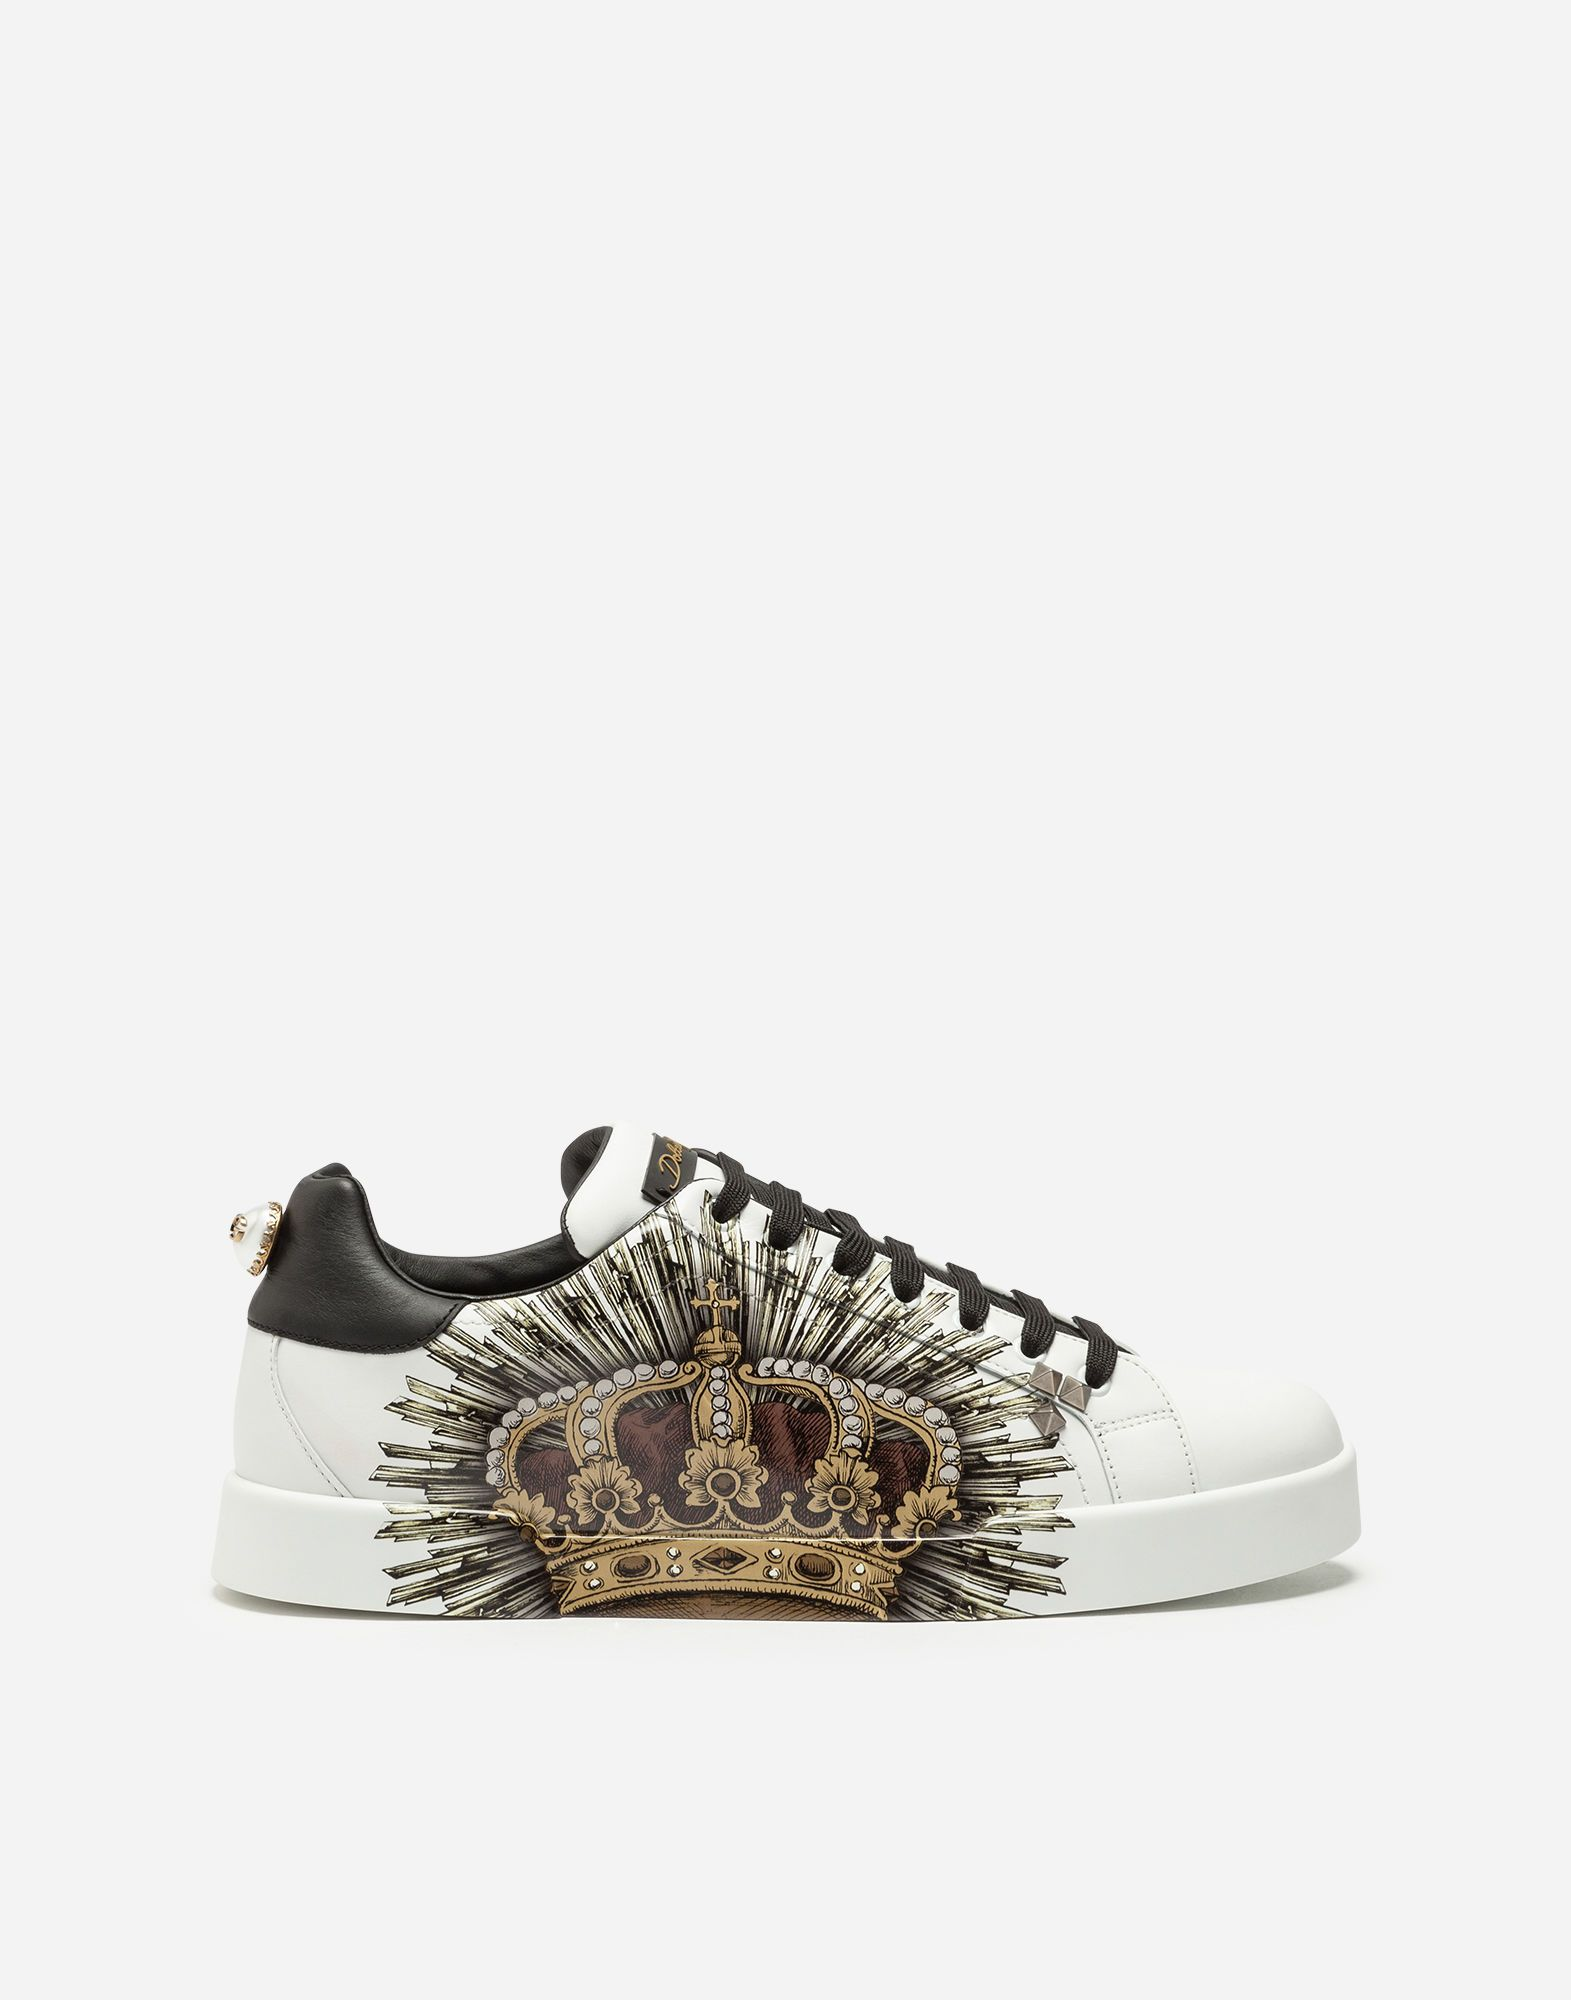 729d81444e677 DOLCE   GABBANA PORTOFINO SNEAKERS IN PRINTED CALFSKIN.  dolcegabbana  shoes